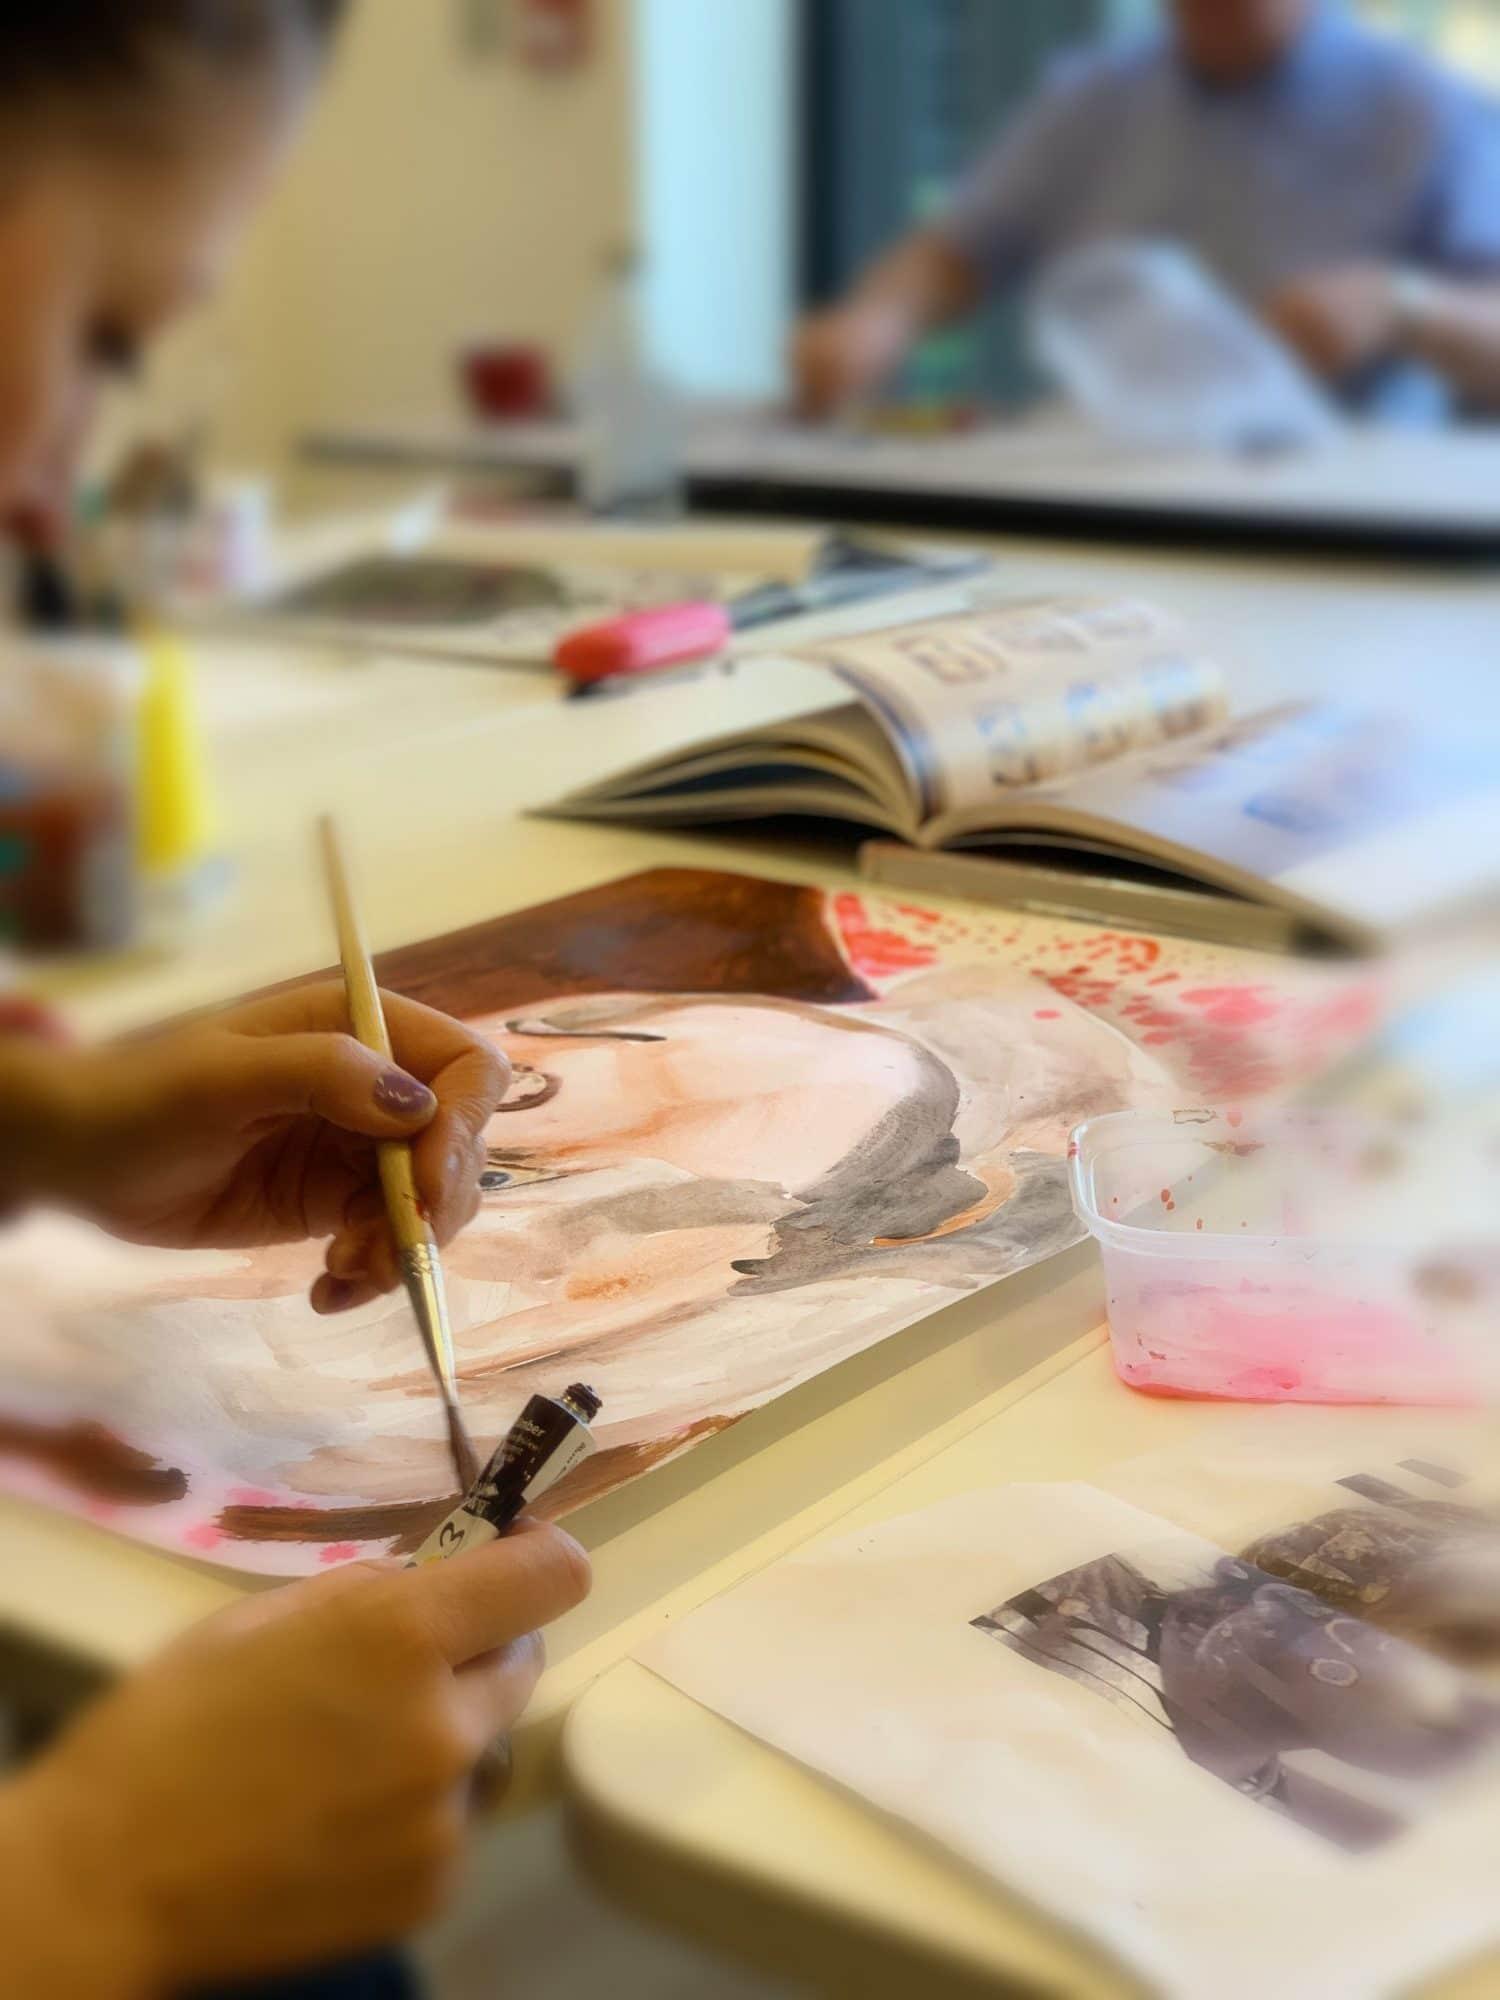 adult art class, workshop, art, Poplar Union, East London, arts and community venue, multi disciplinary arts centre, theatre, cafe, gig venue, workshops, community, Poplar, Tower Hamlets